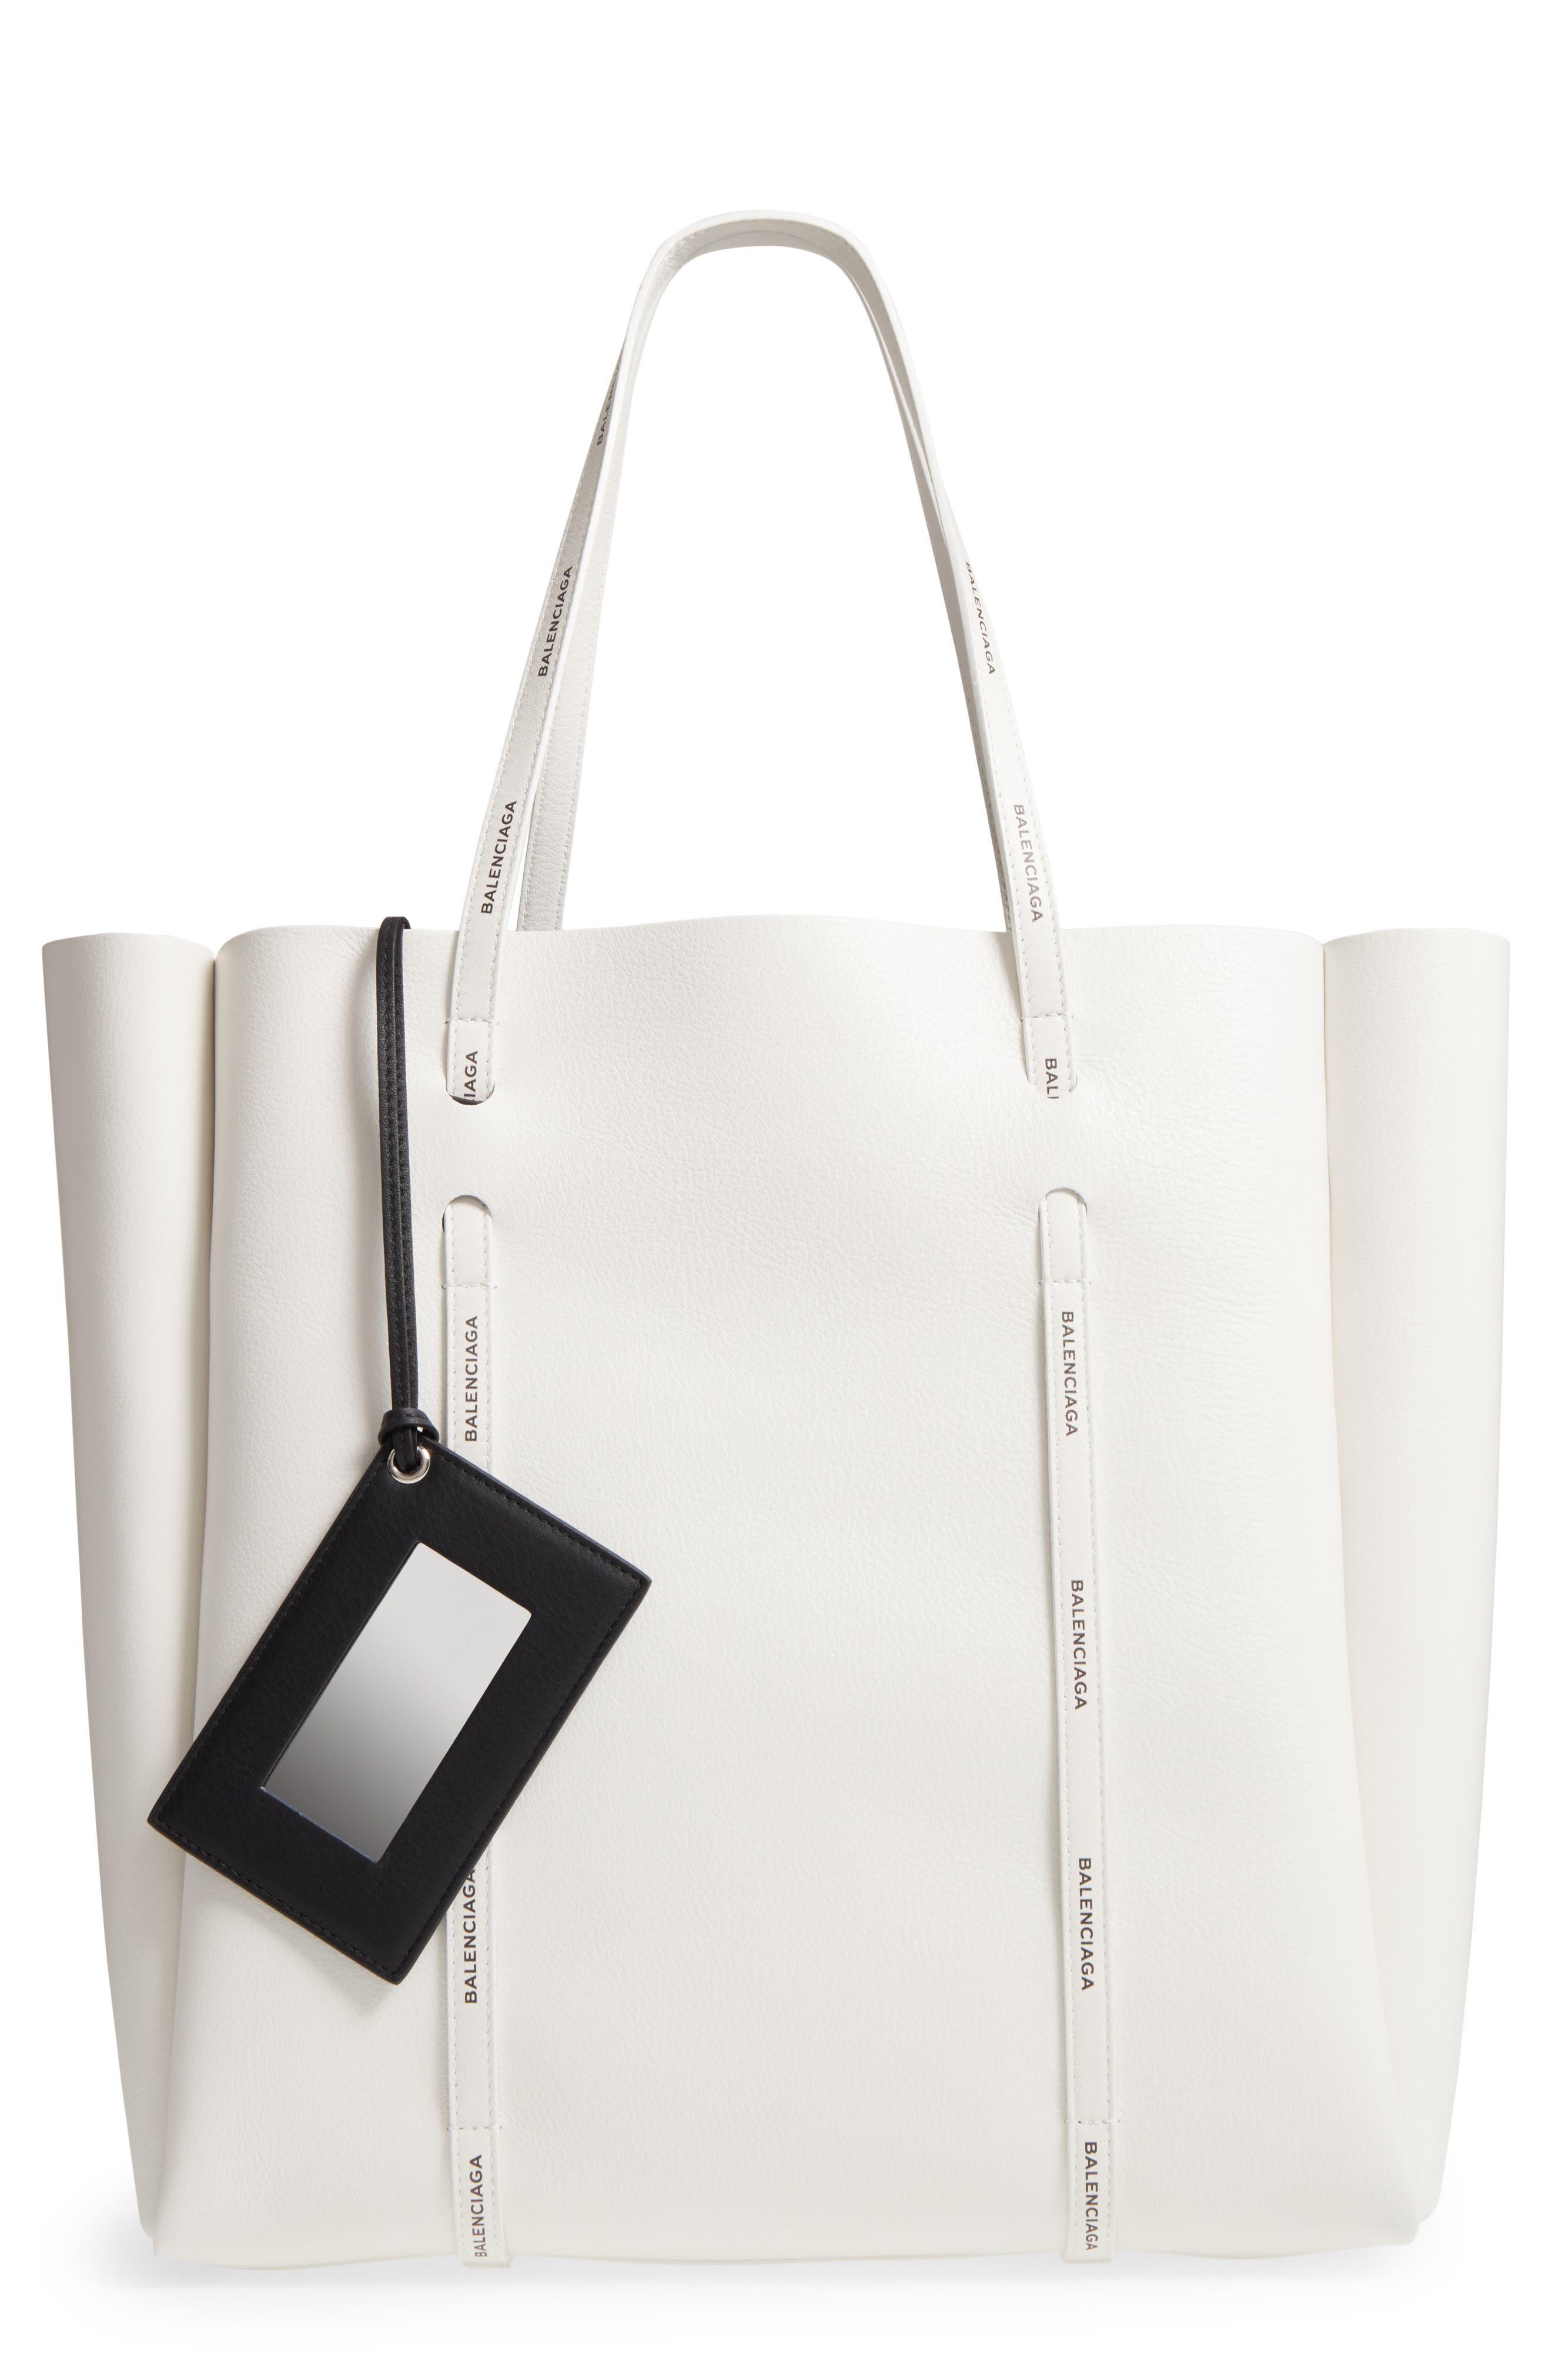 Medium Everyday Calfskin Tote,                         Main,                         color, Blanc/ Black